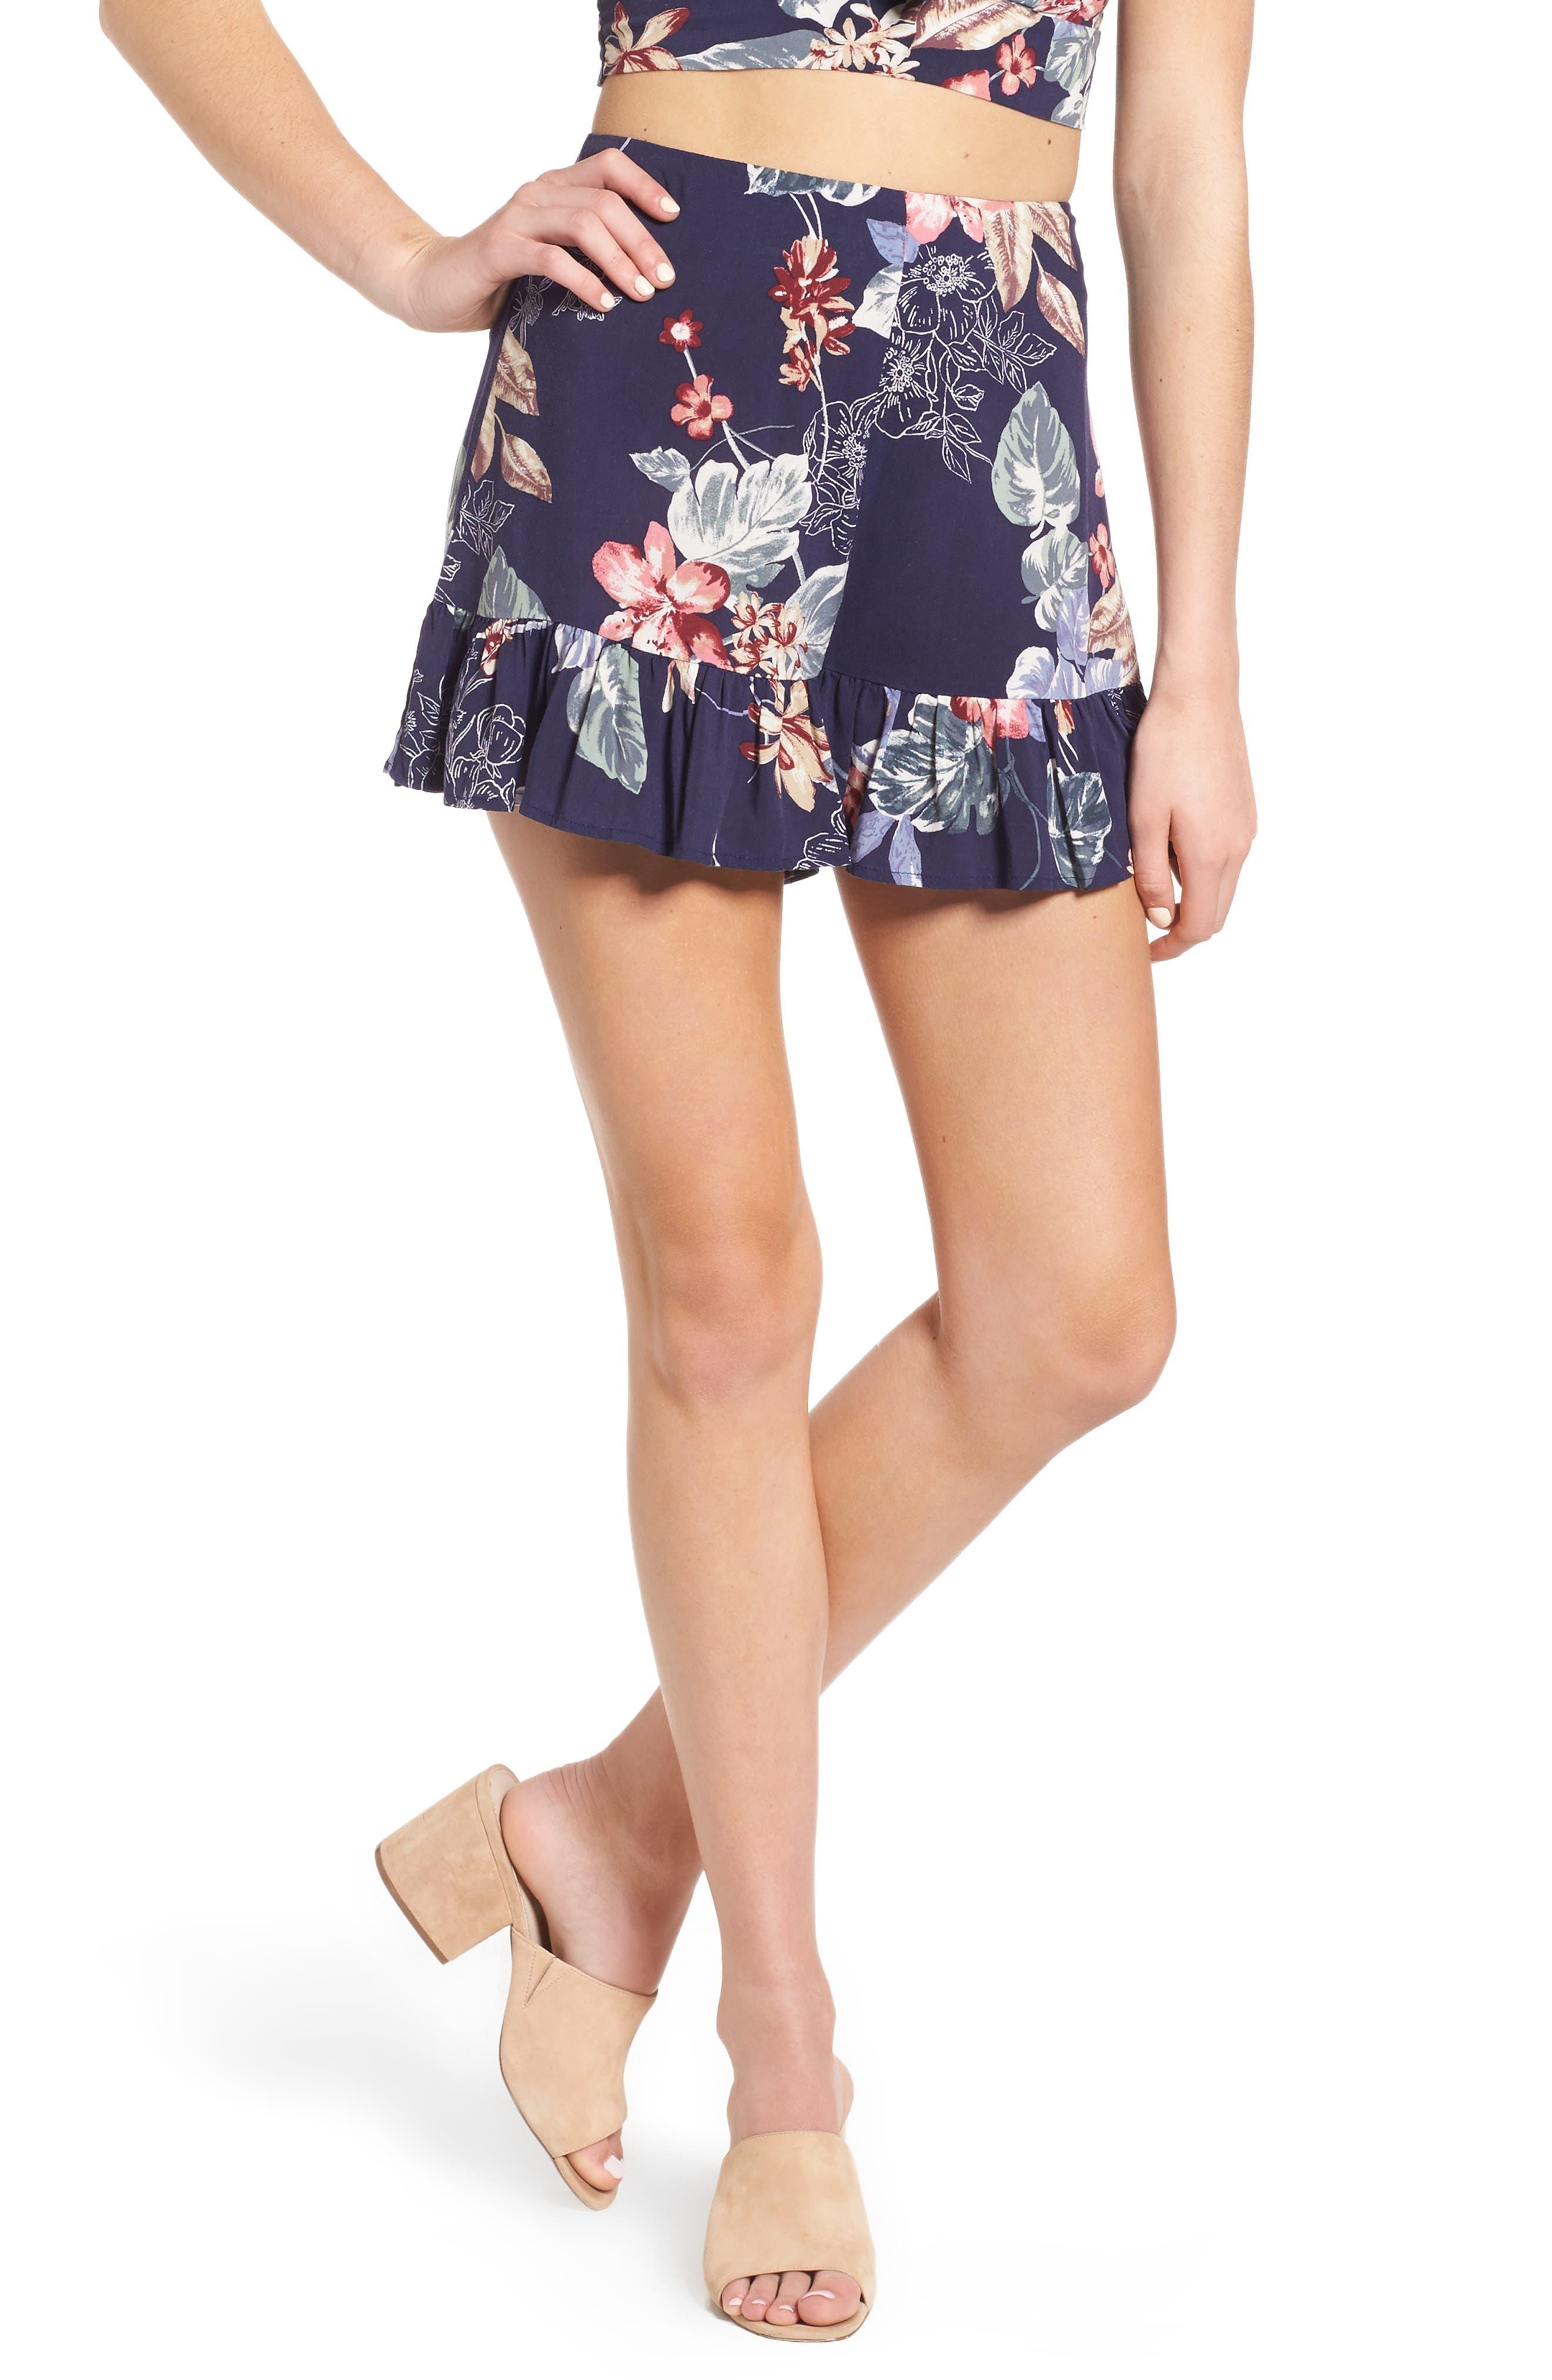 Ruffle Floral High Waist Shorts,                         Main,                         color, Navy Floral Print